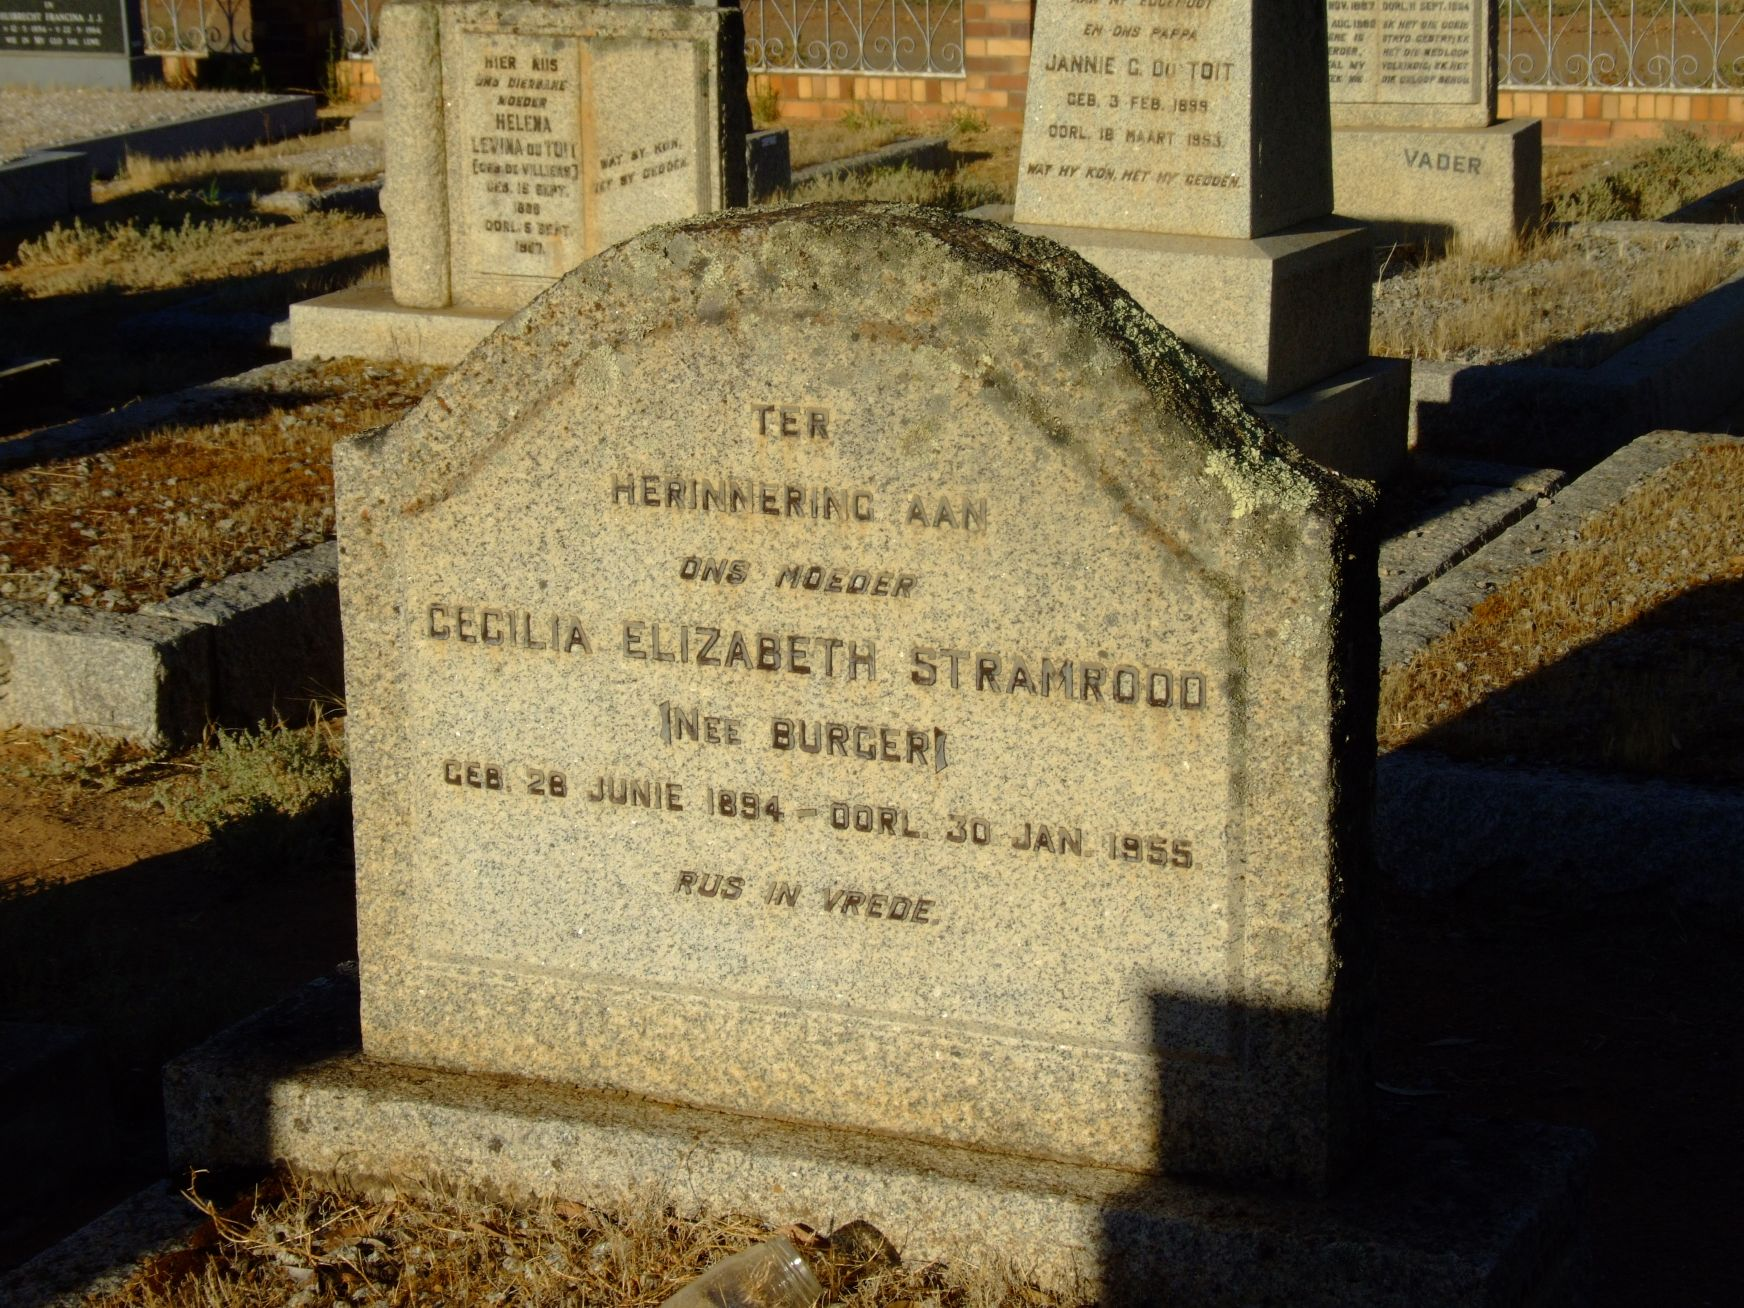 Stramrood, Cecilia Elizabeth